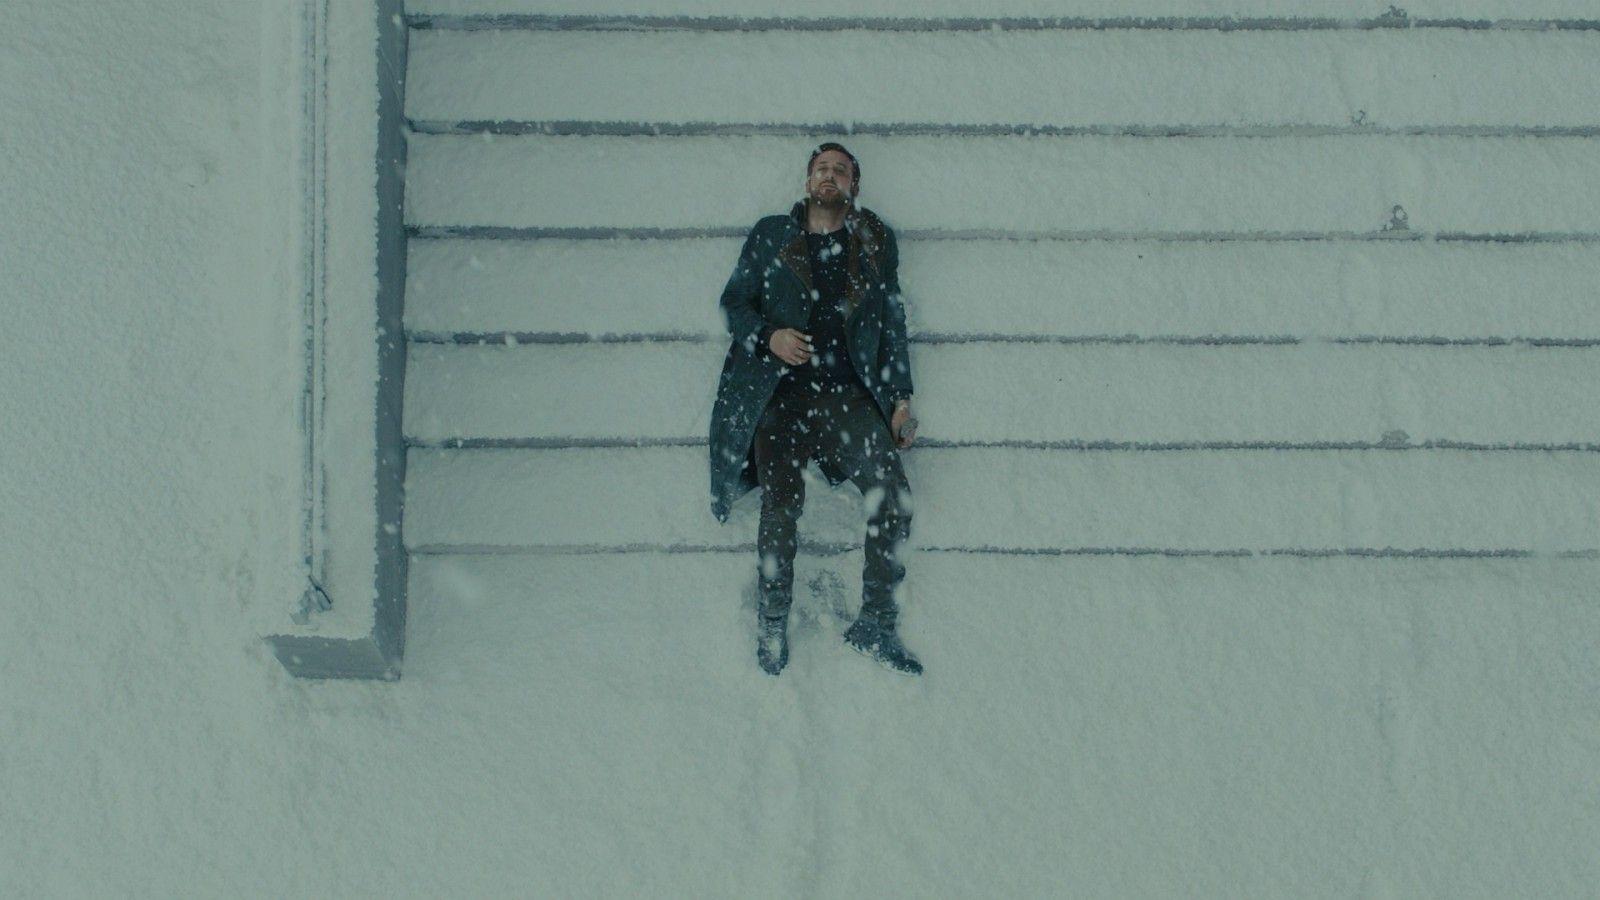 Blade Runner Blade Runner 2049 Snow Winter Stairs Movies Men Actor Ryan Gosling Lying Down